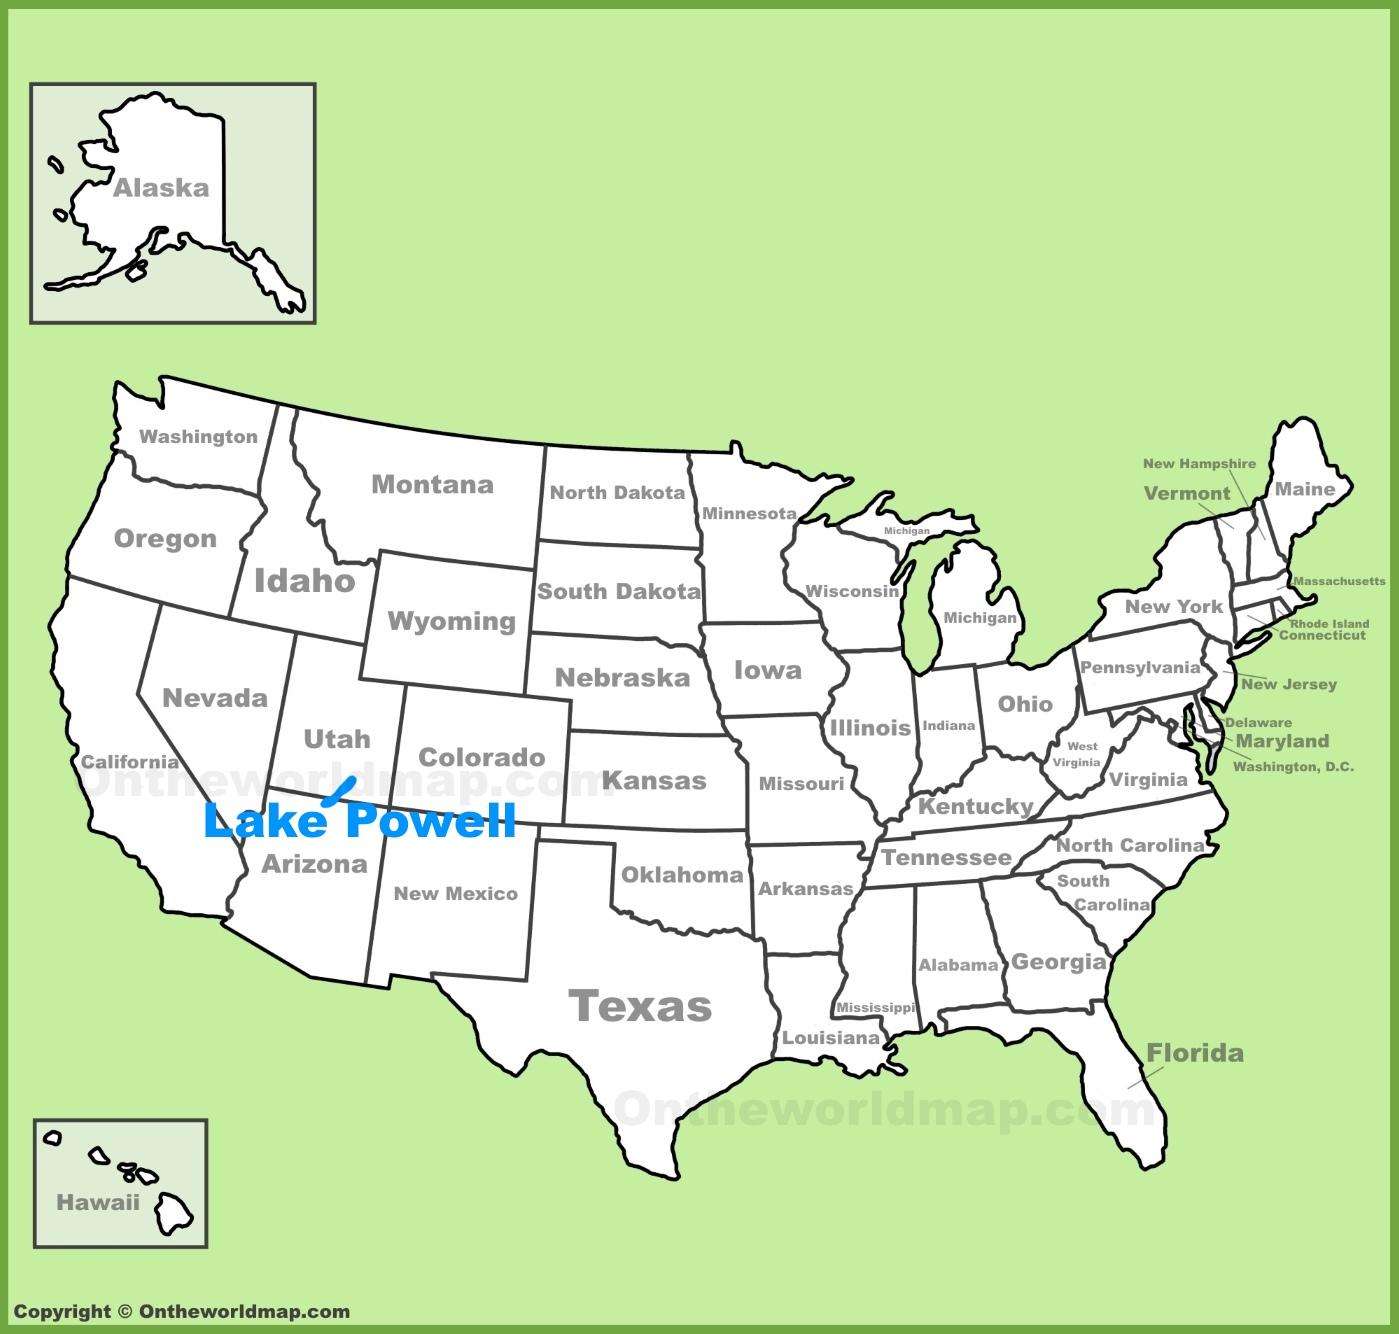 Lake Powell Map Lake Powell Maps | Maps of Lake Powell Lake Powell Map